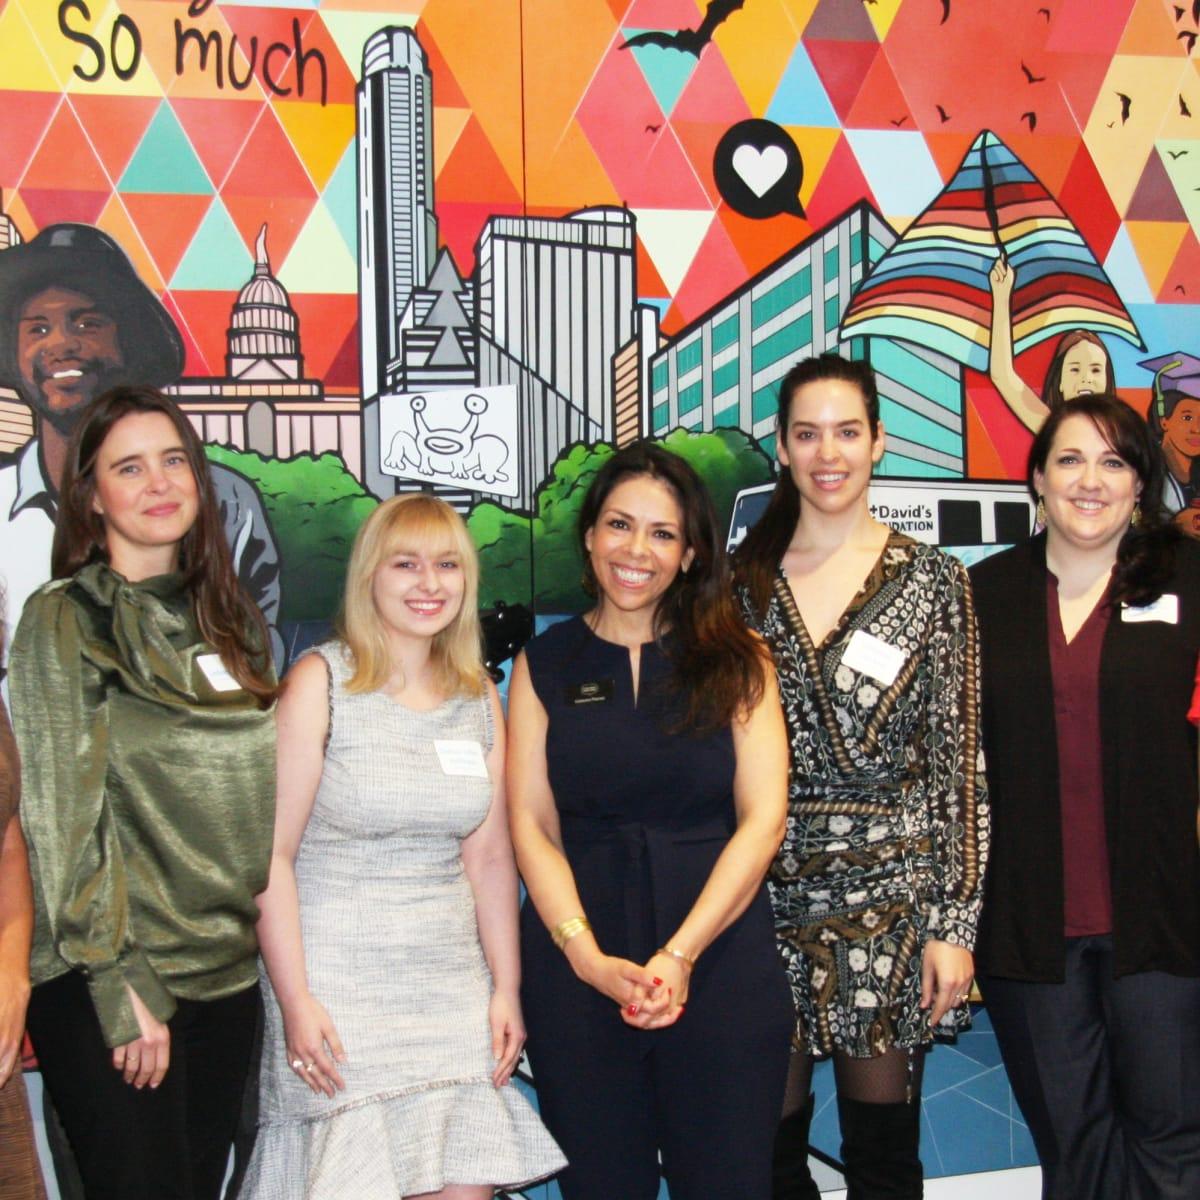 Cassie Swenson, Lindsay Muse, Chelsea Toler-Hoffmann, Celeste Flores, Catherine Lucchesi, Amy Morris, Christine Herlin at St. David's Foundation 